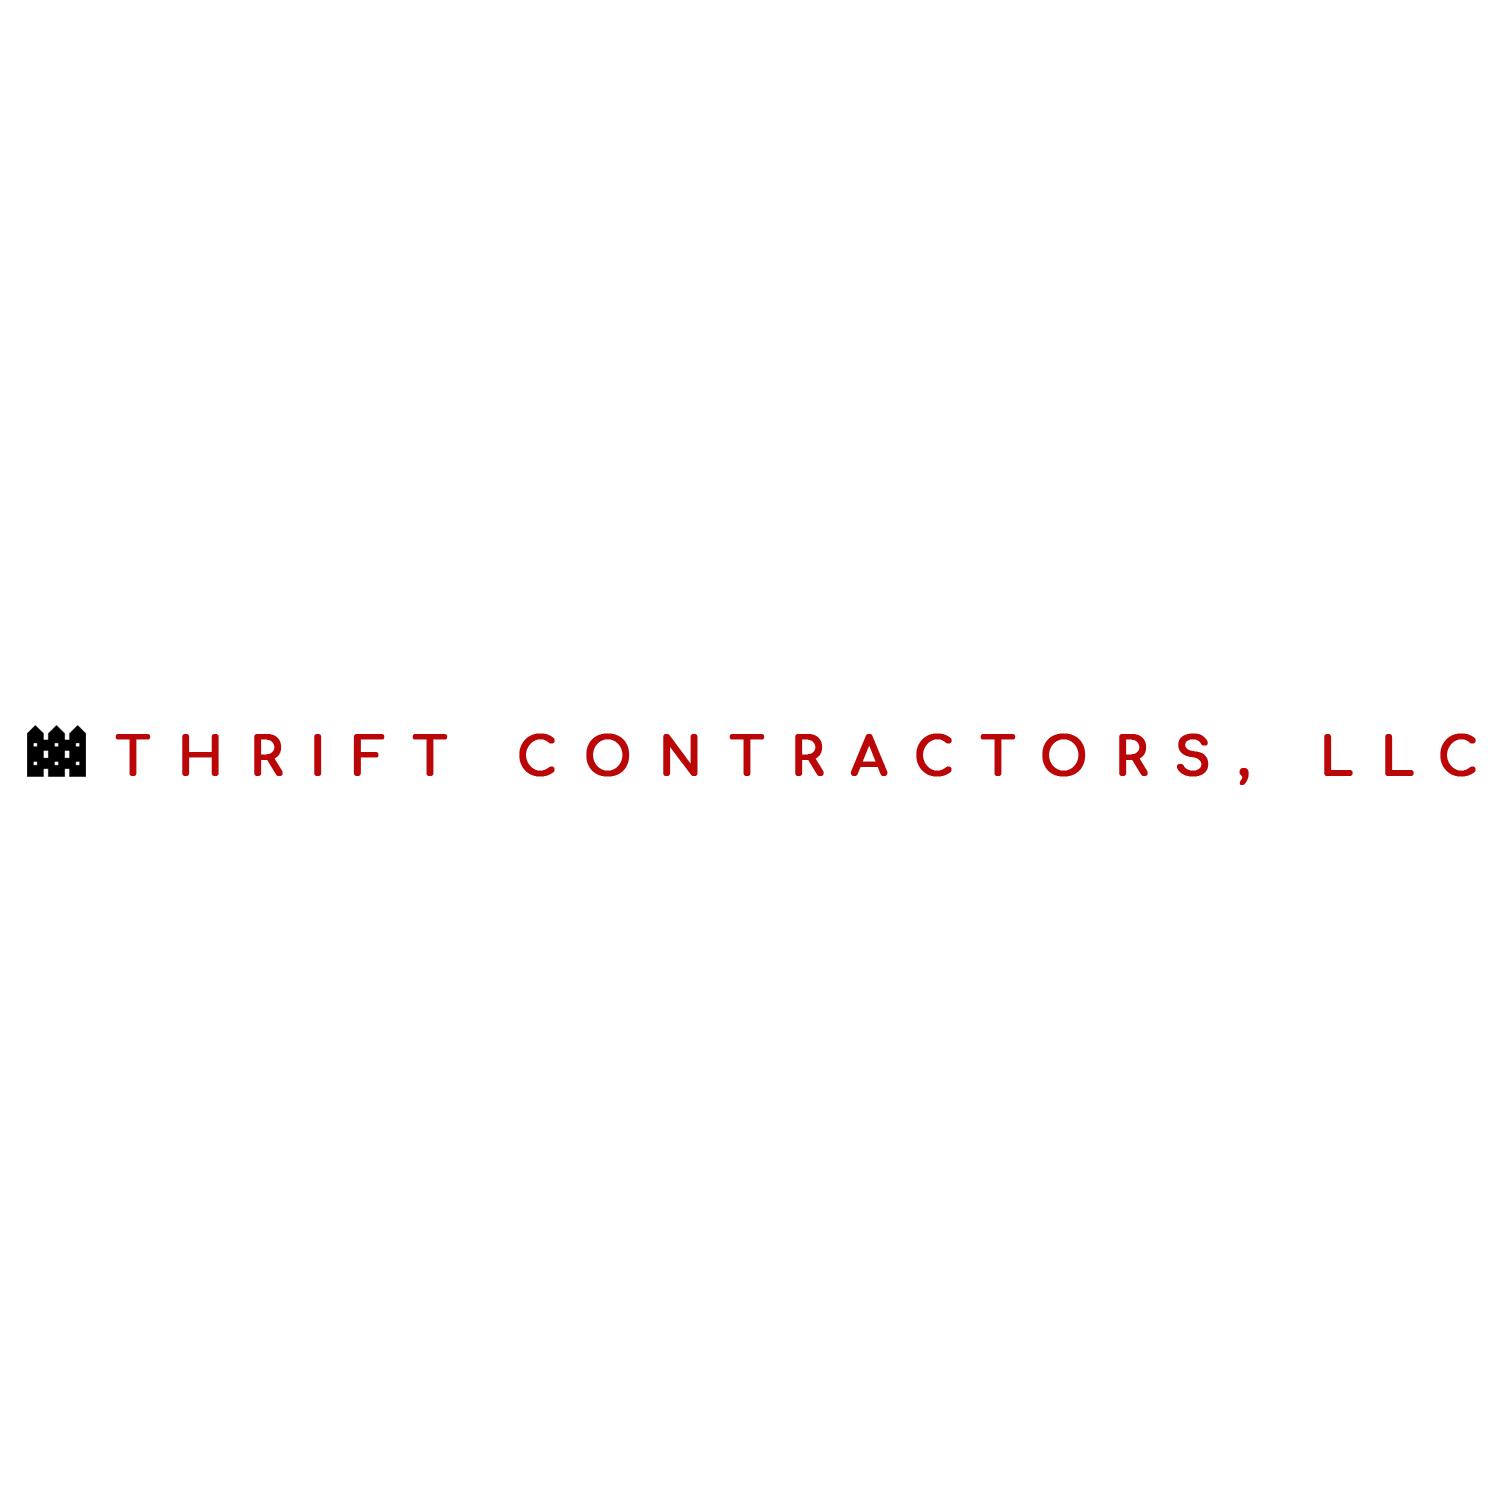 Thrift Contractors, LLC image 3